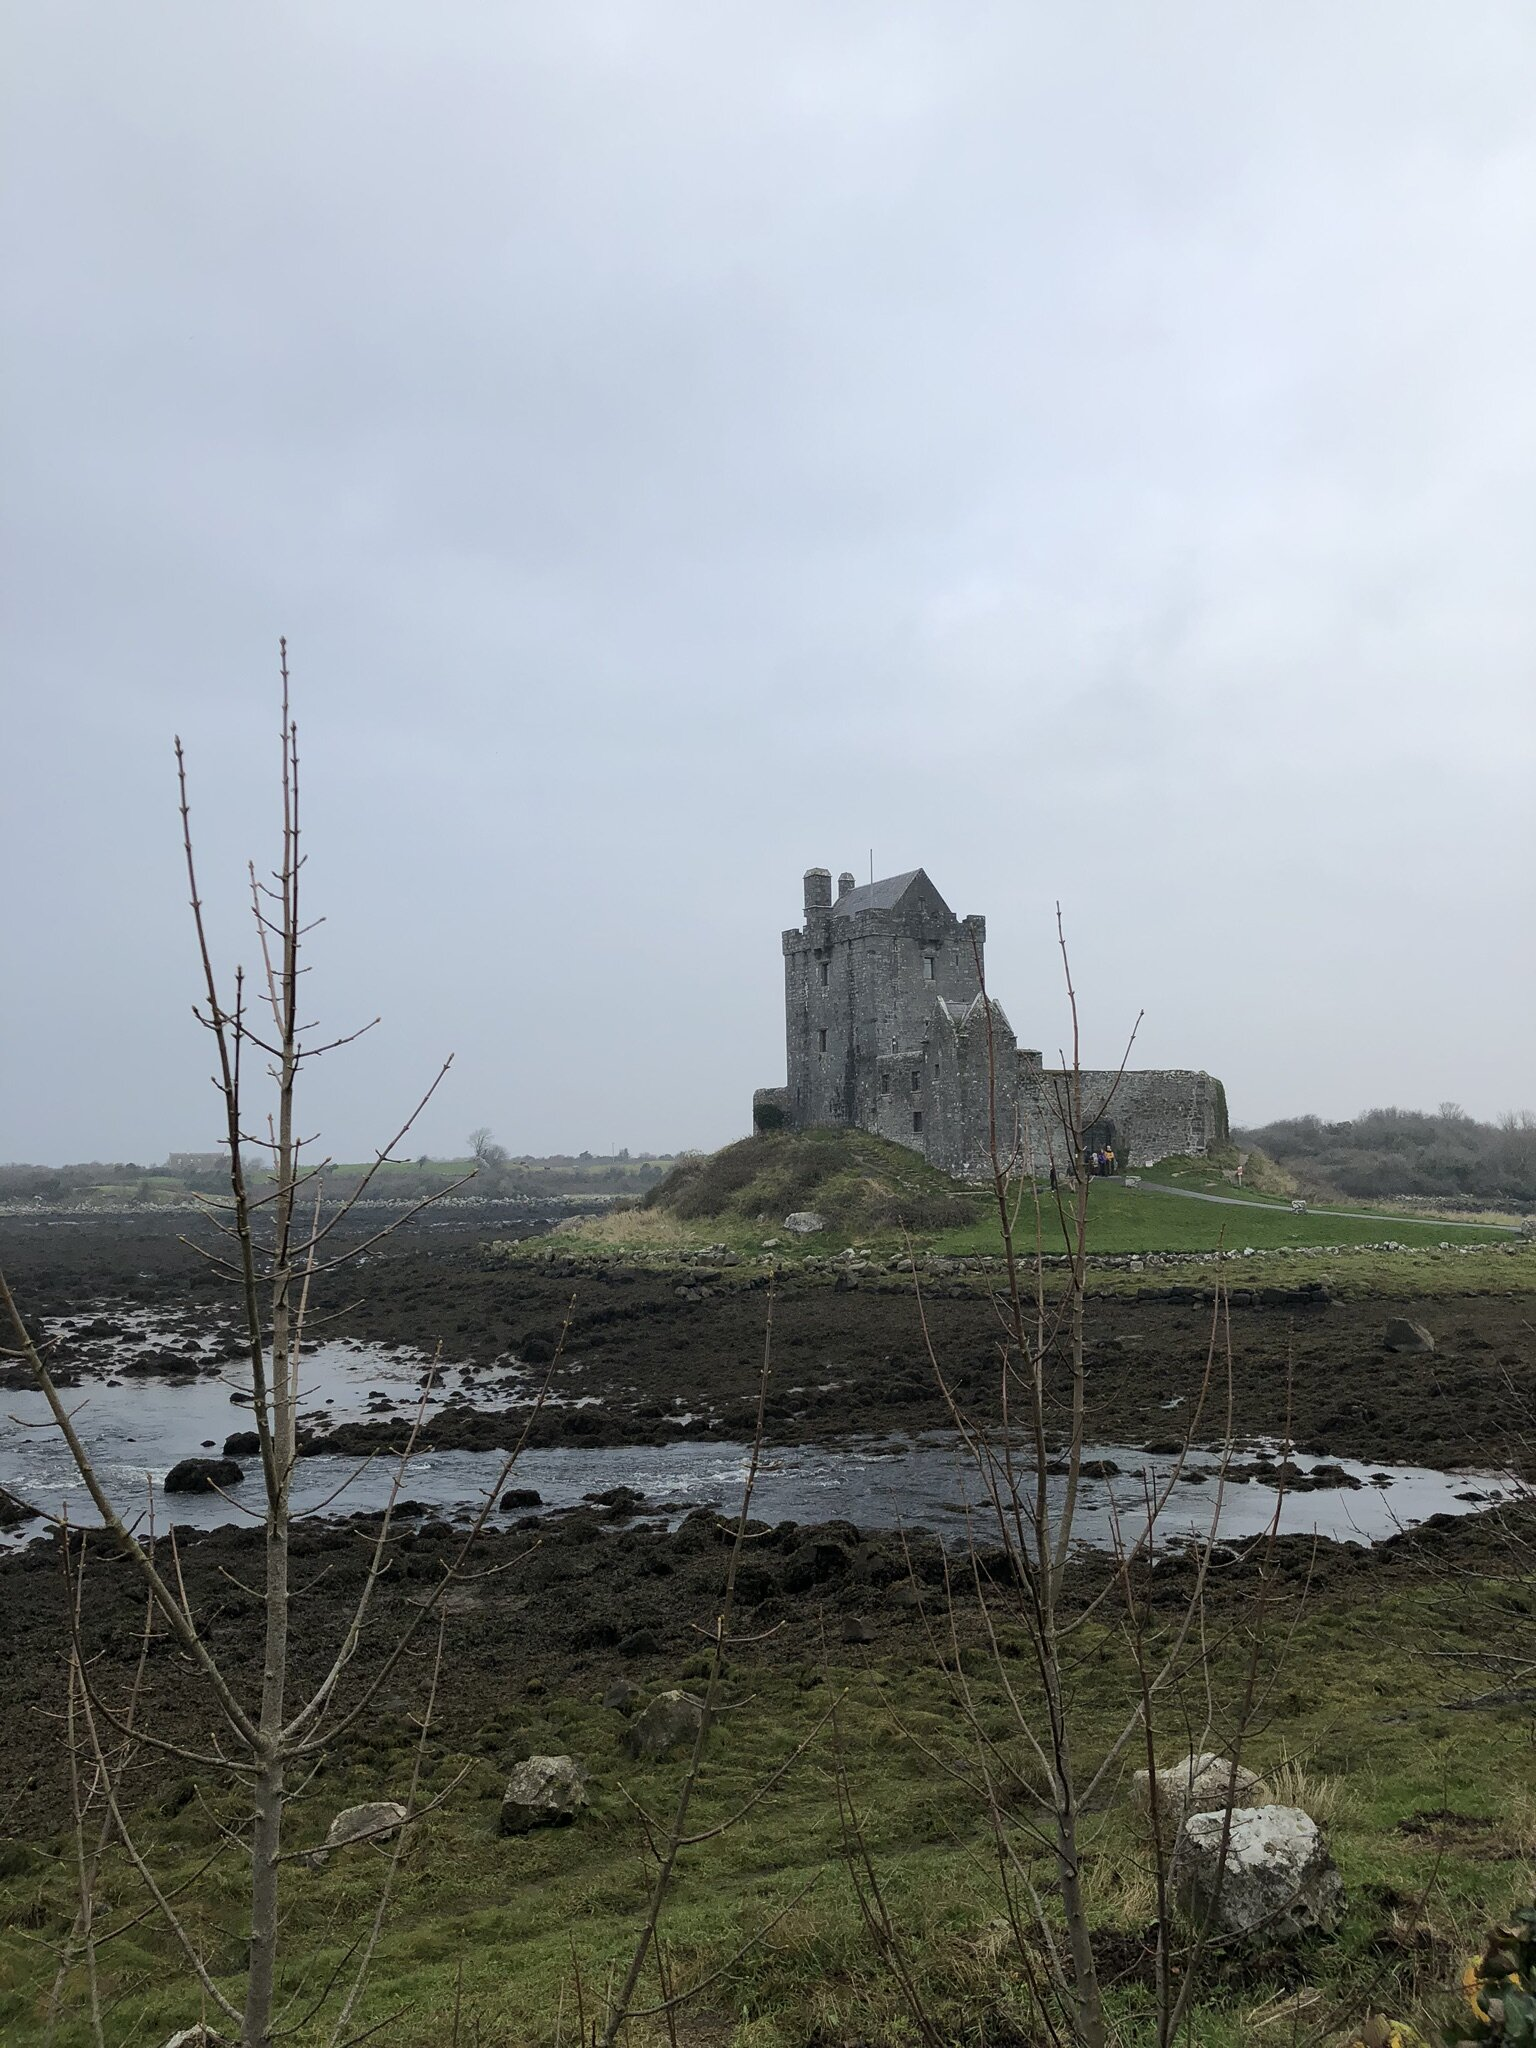 Dunguire castle in Kinvara, Ireland